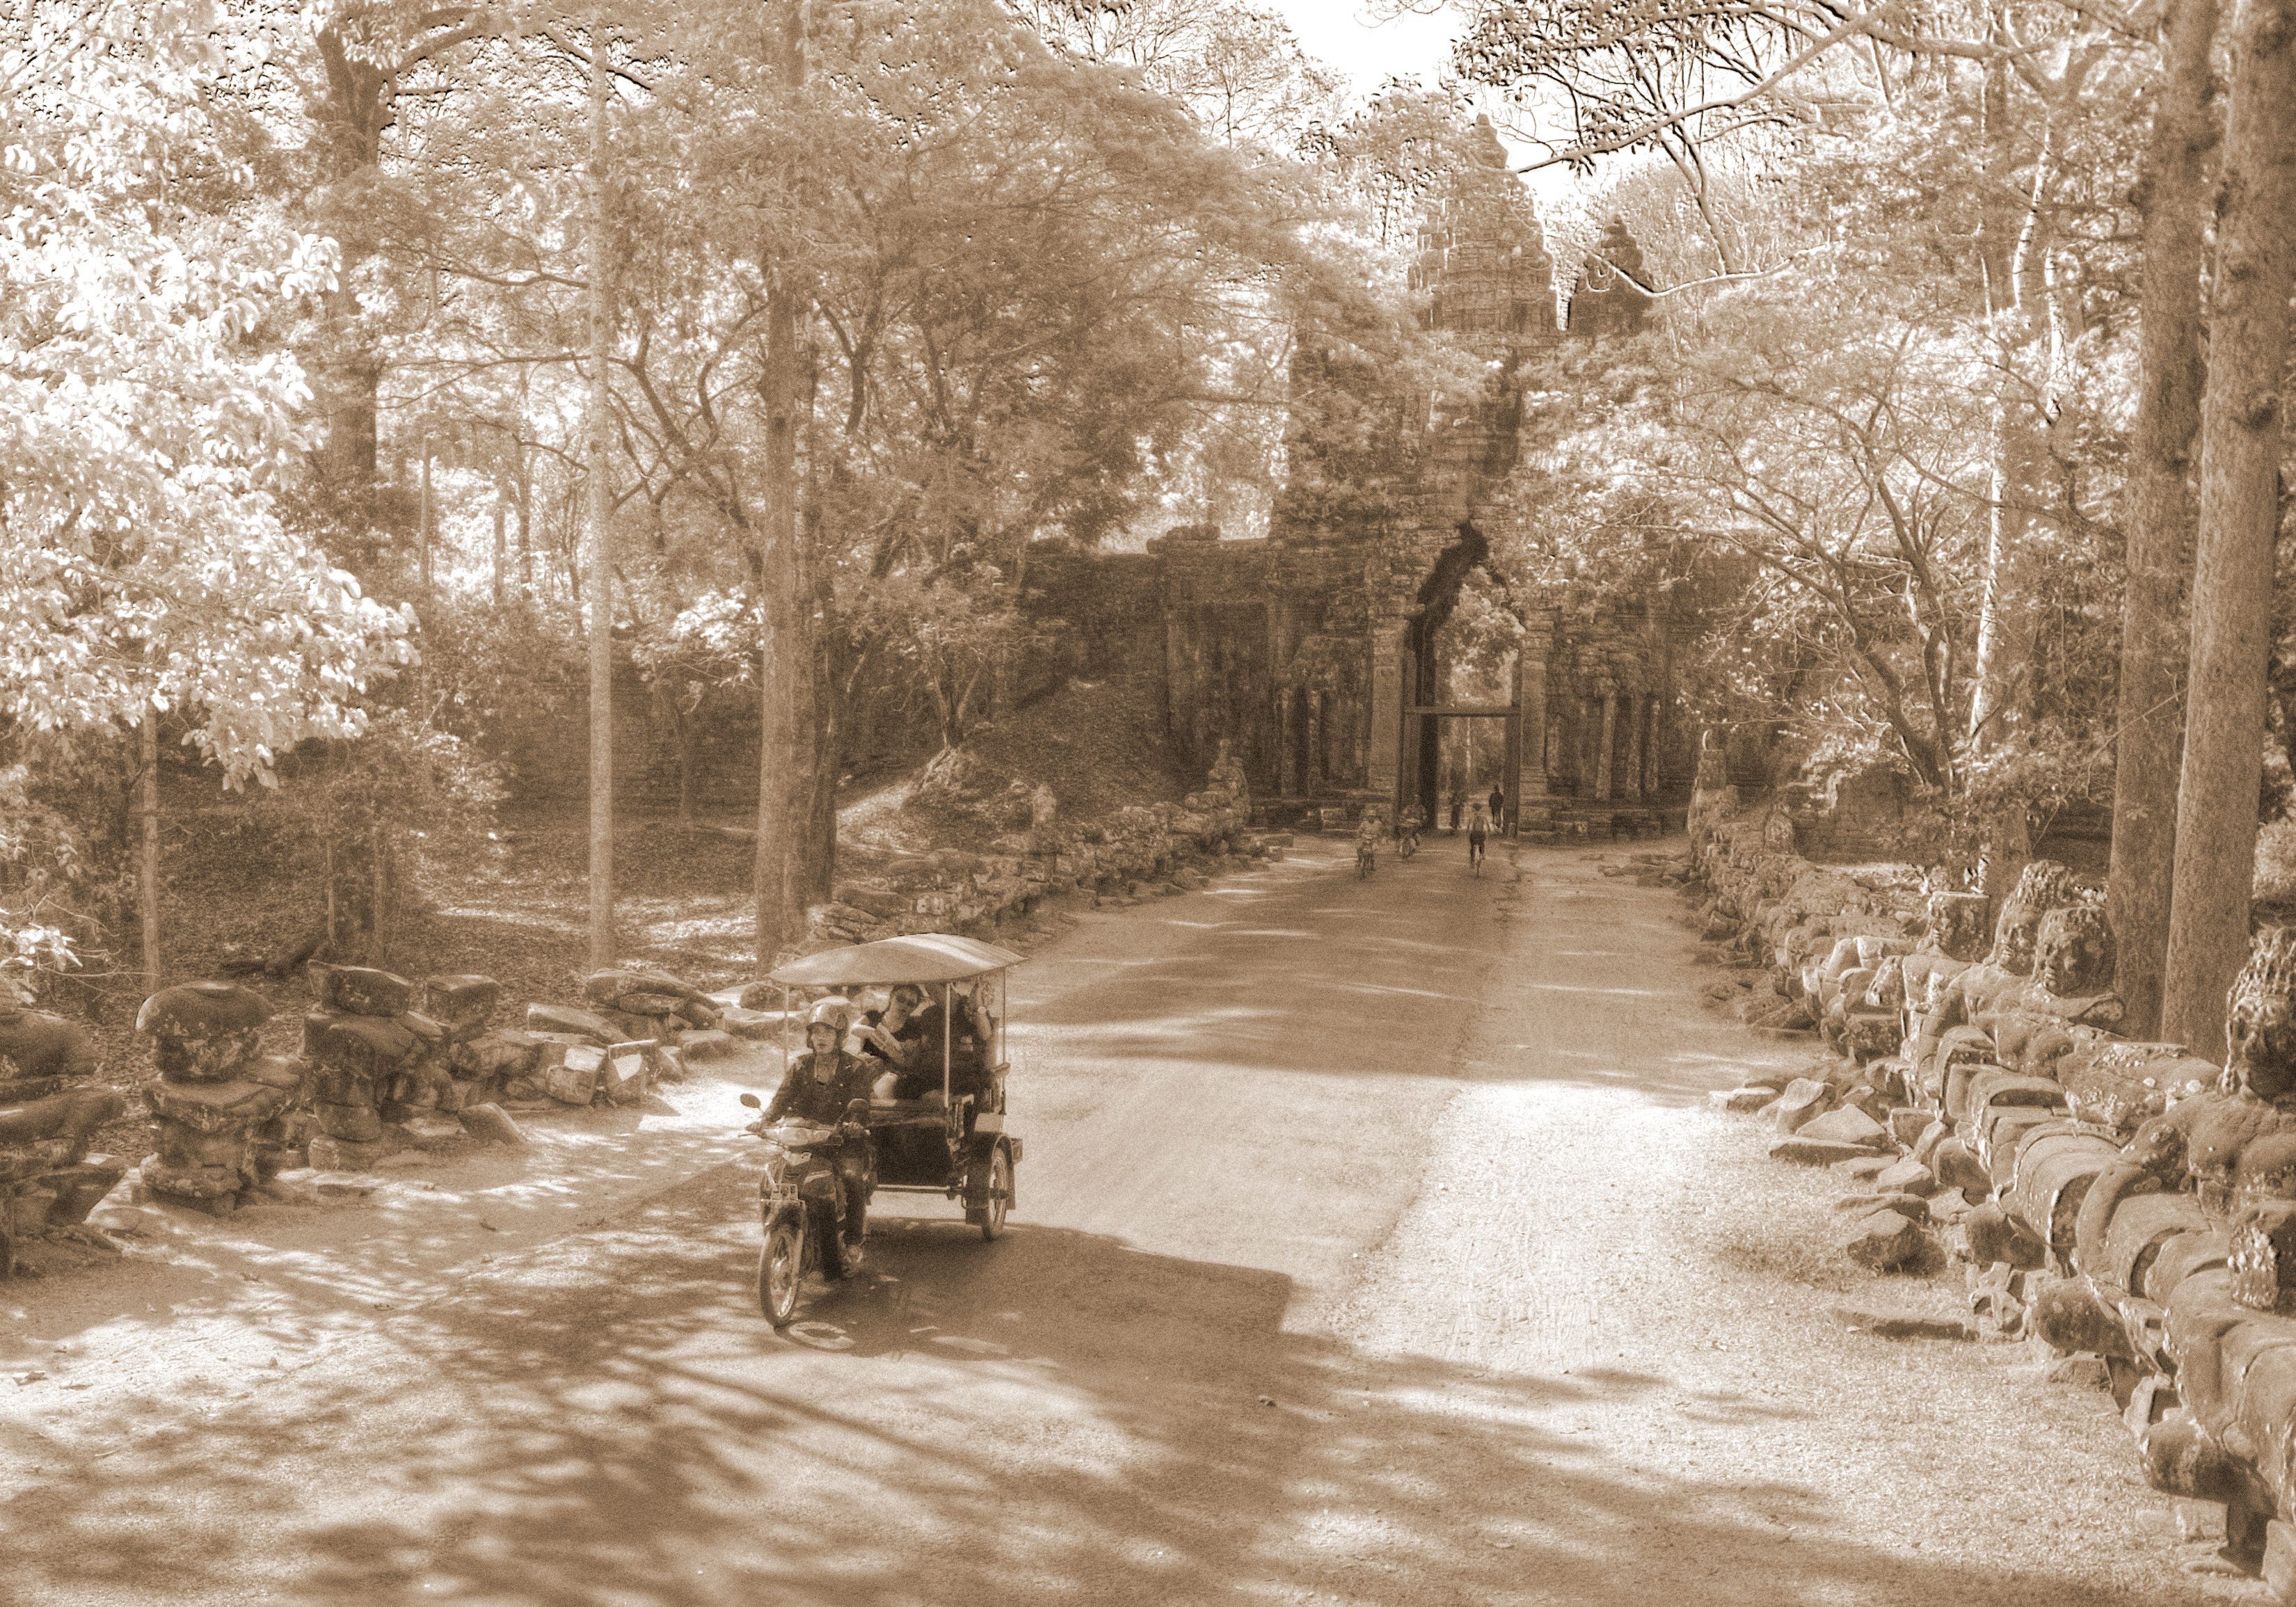 Road entering the Ancient city of Angkor Thom.